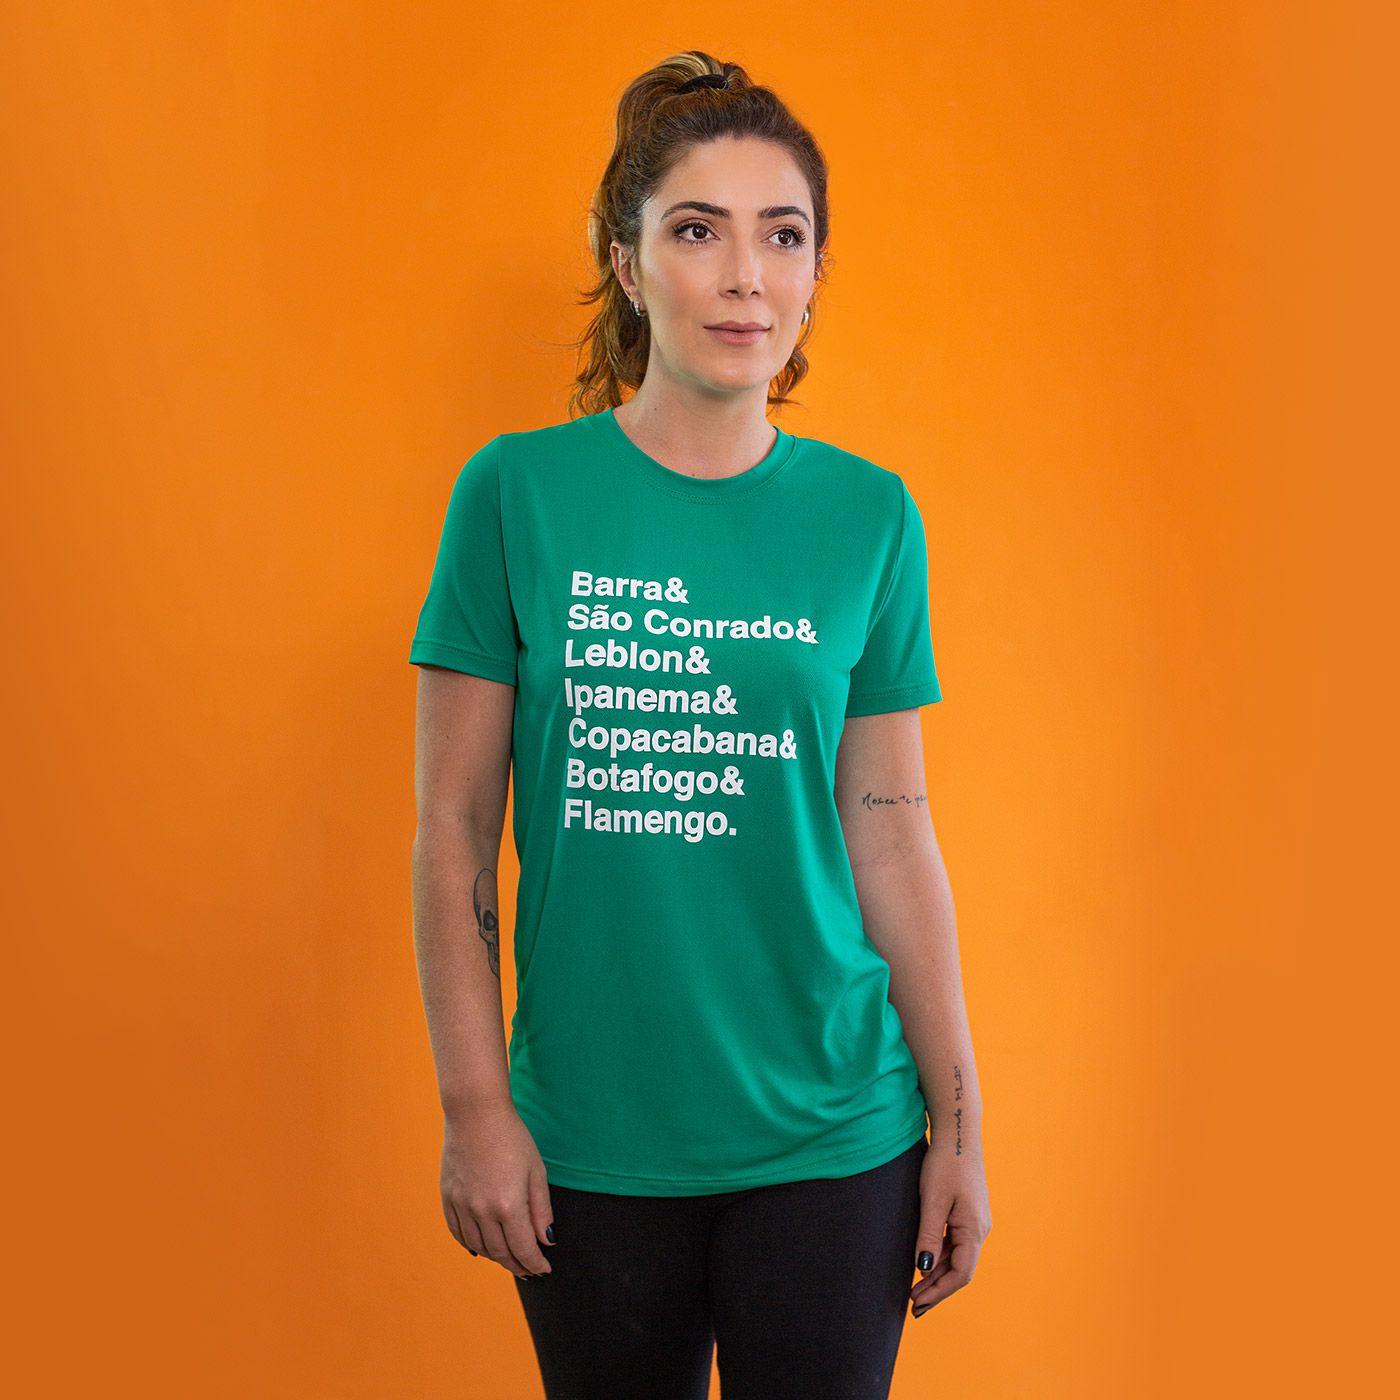 Camiseta Feminina Longão - Meia Maratona do Rio